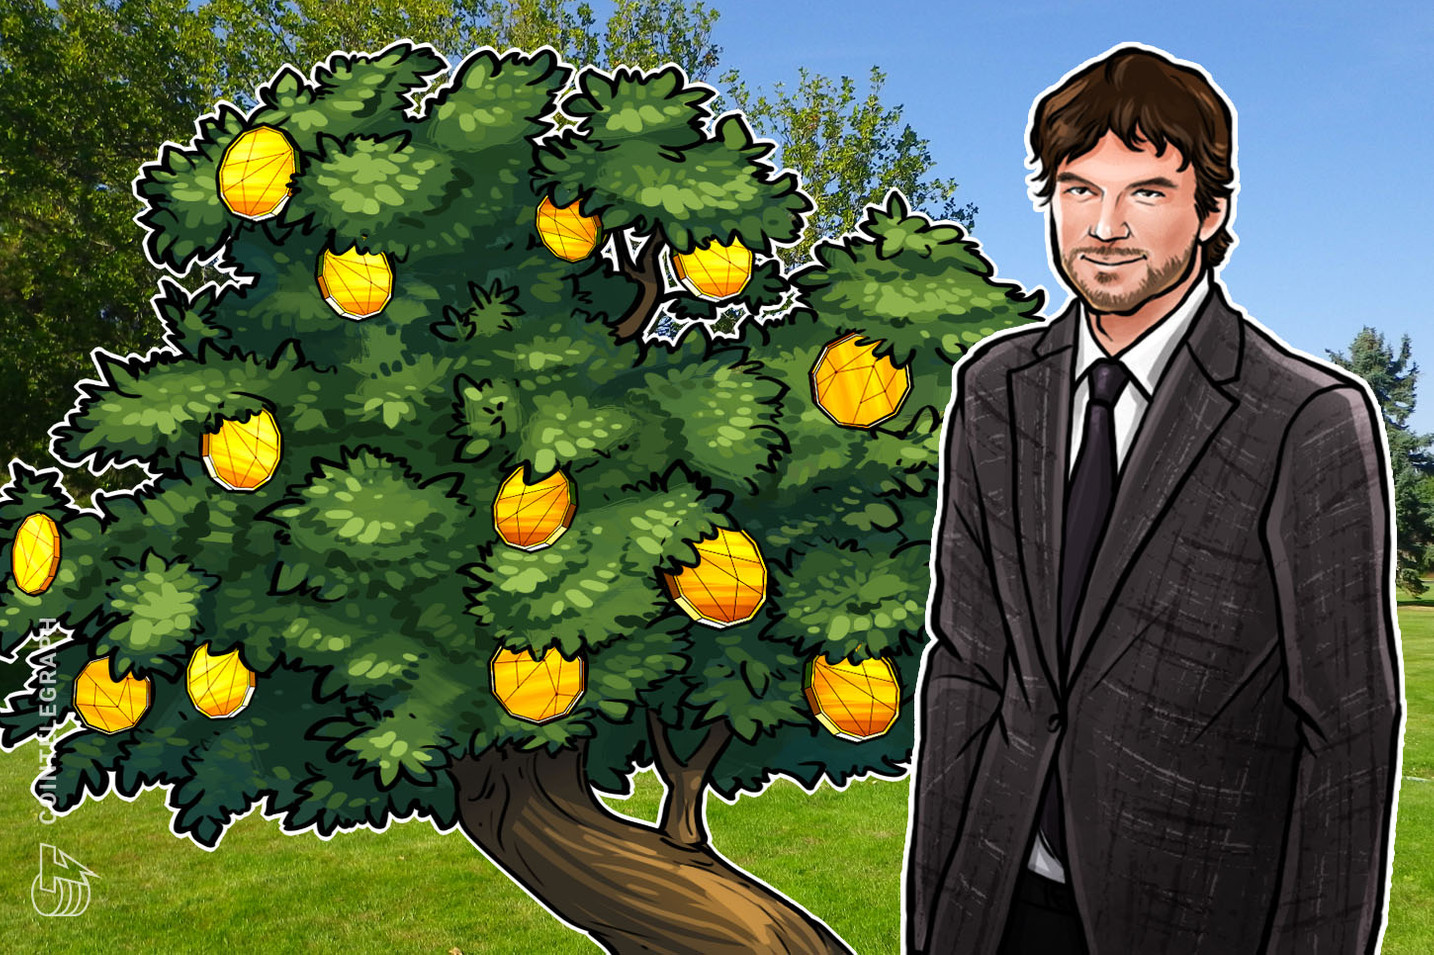 Ashton Kutcher Participates in Lolli's $3M Seed Round